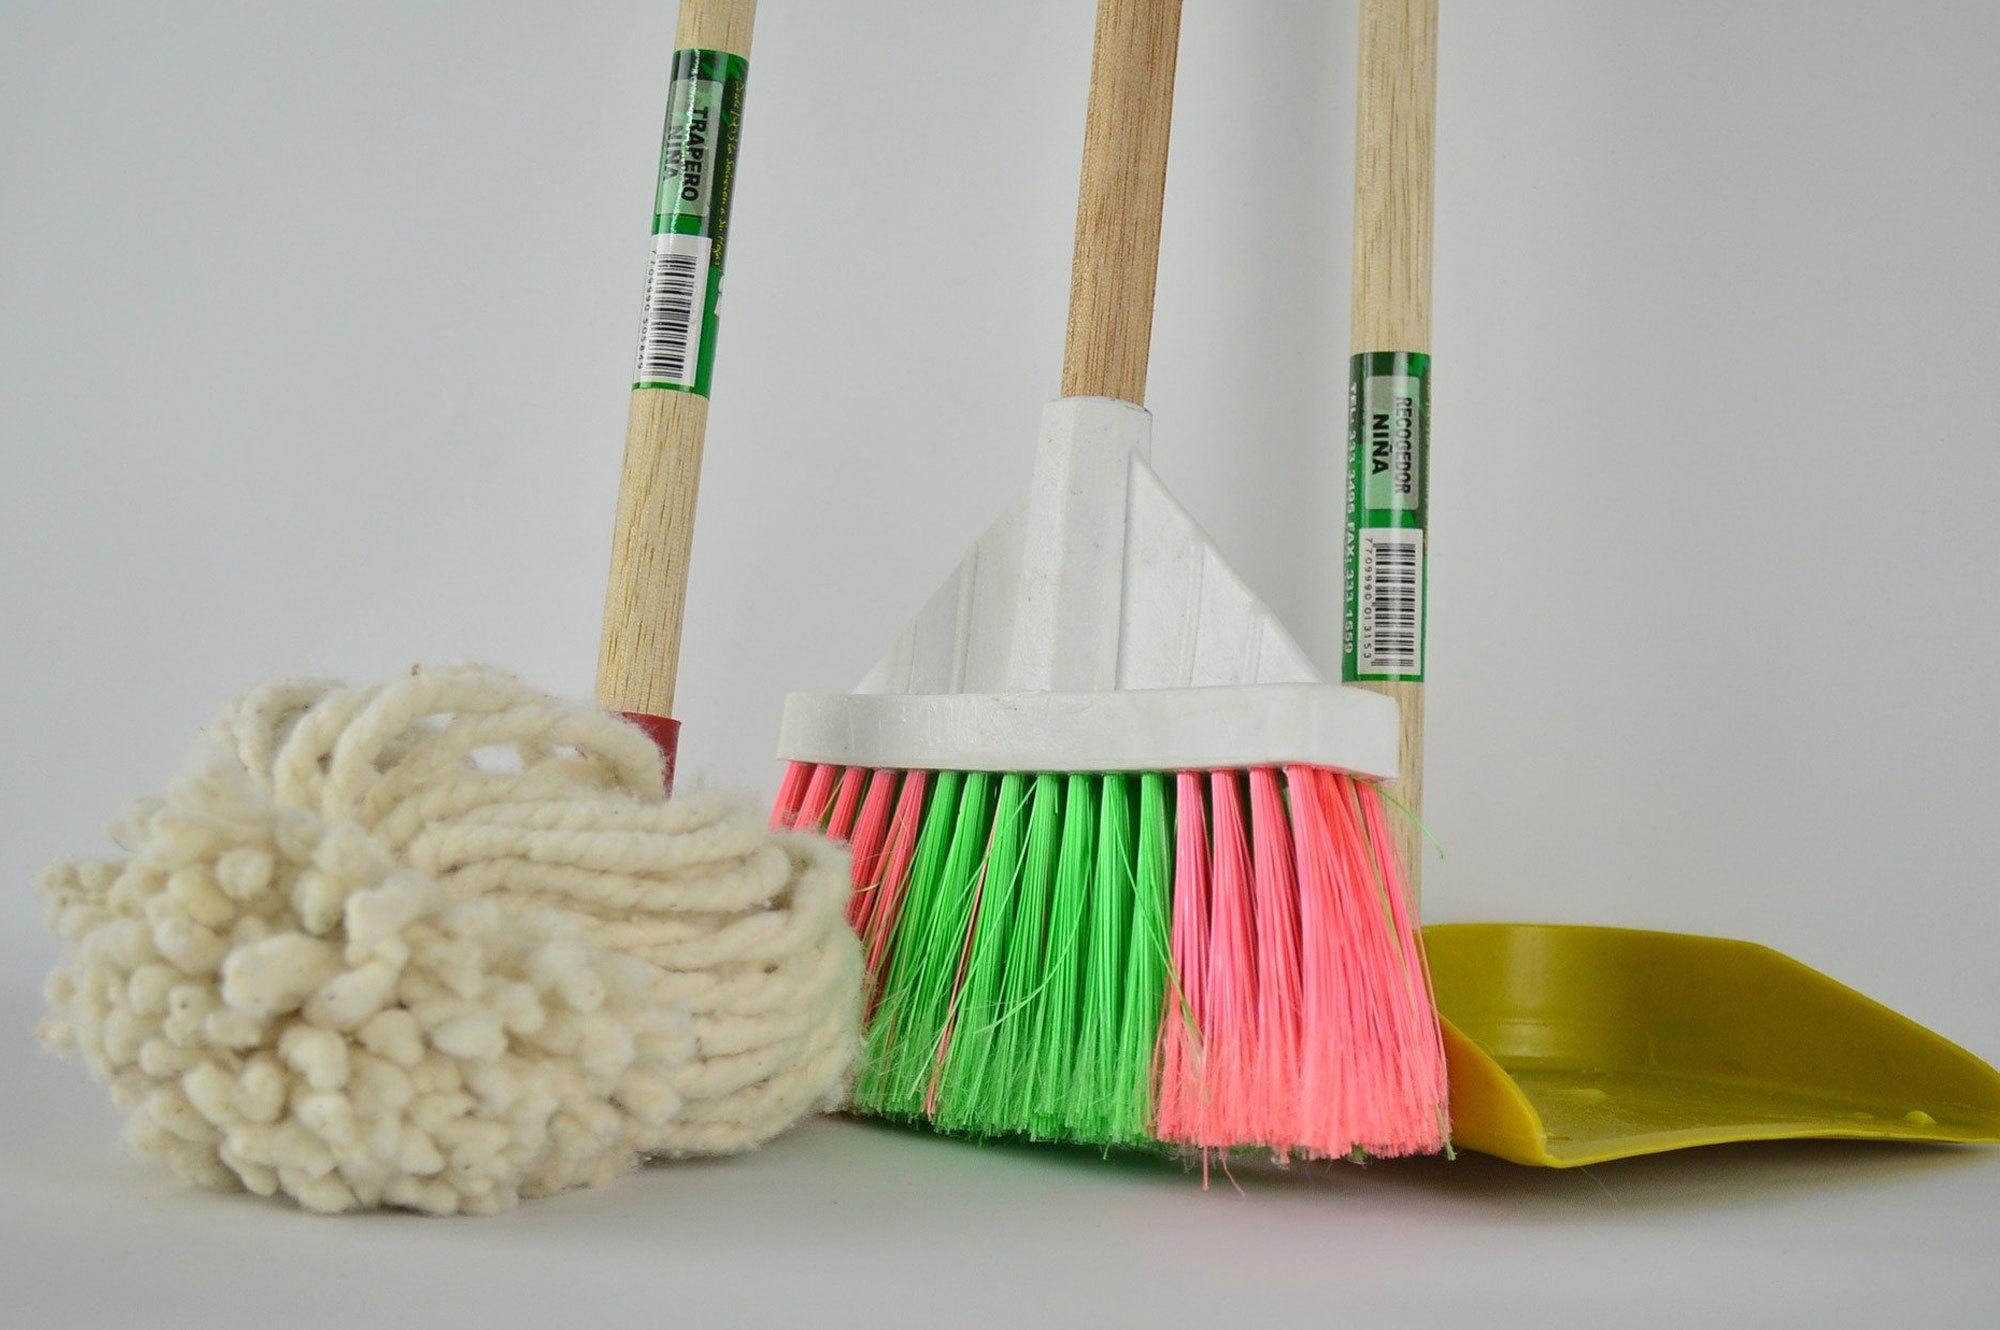 Smart Clean Pro - Nettoyage professionnel